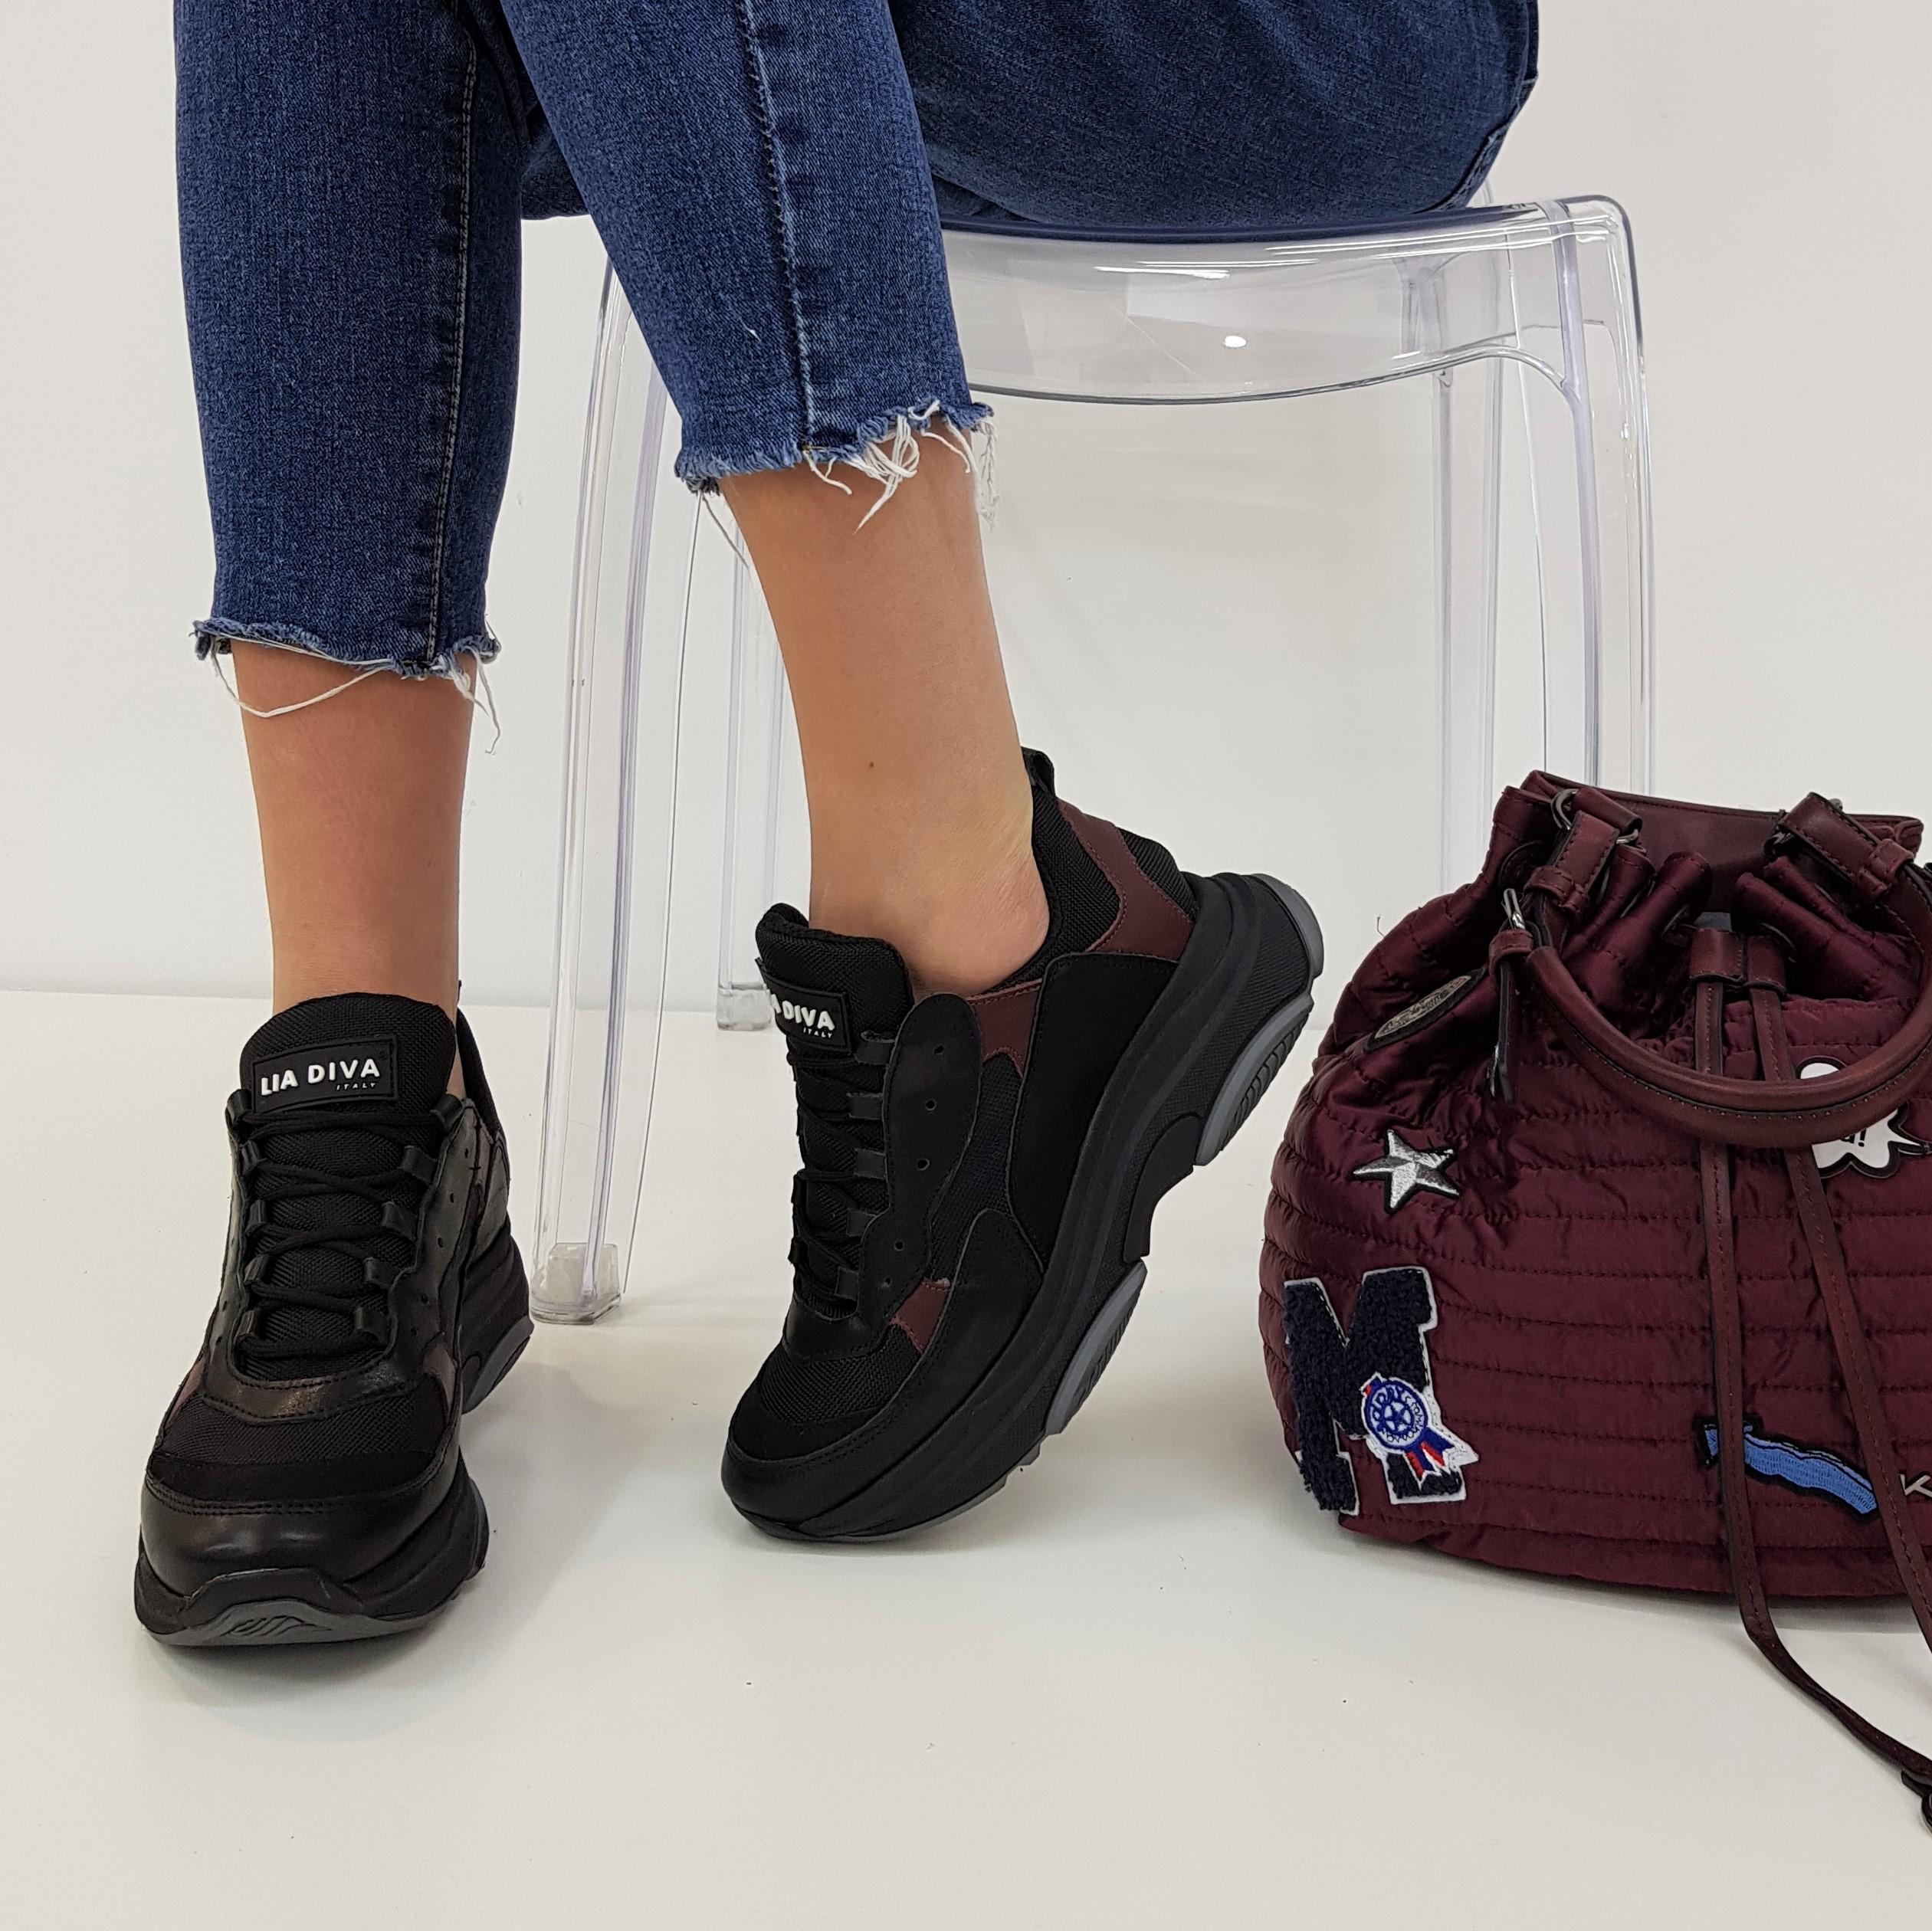 Sneakers lacci pelle nero e bordeaux kent1 ben - Lia diva scarpe ...